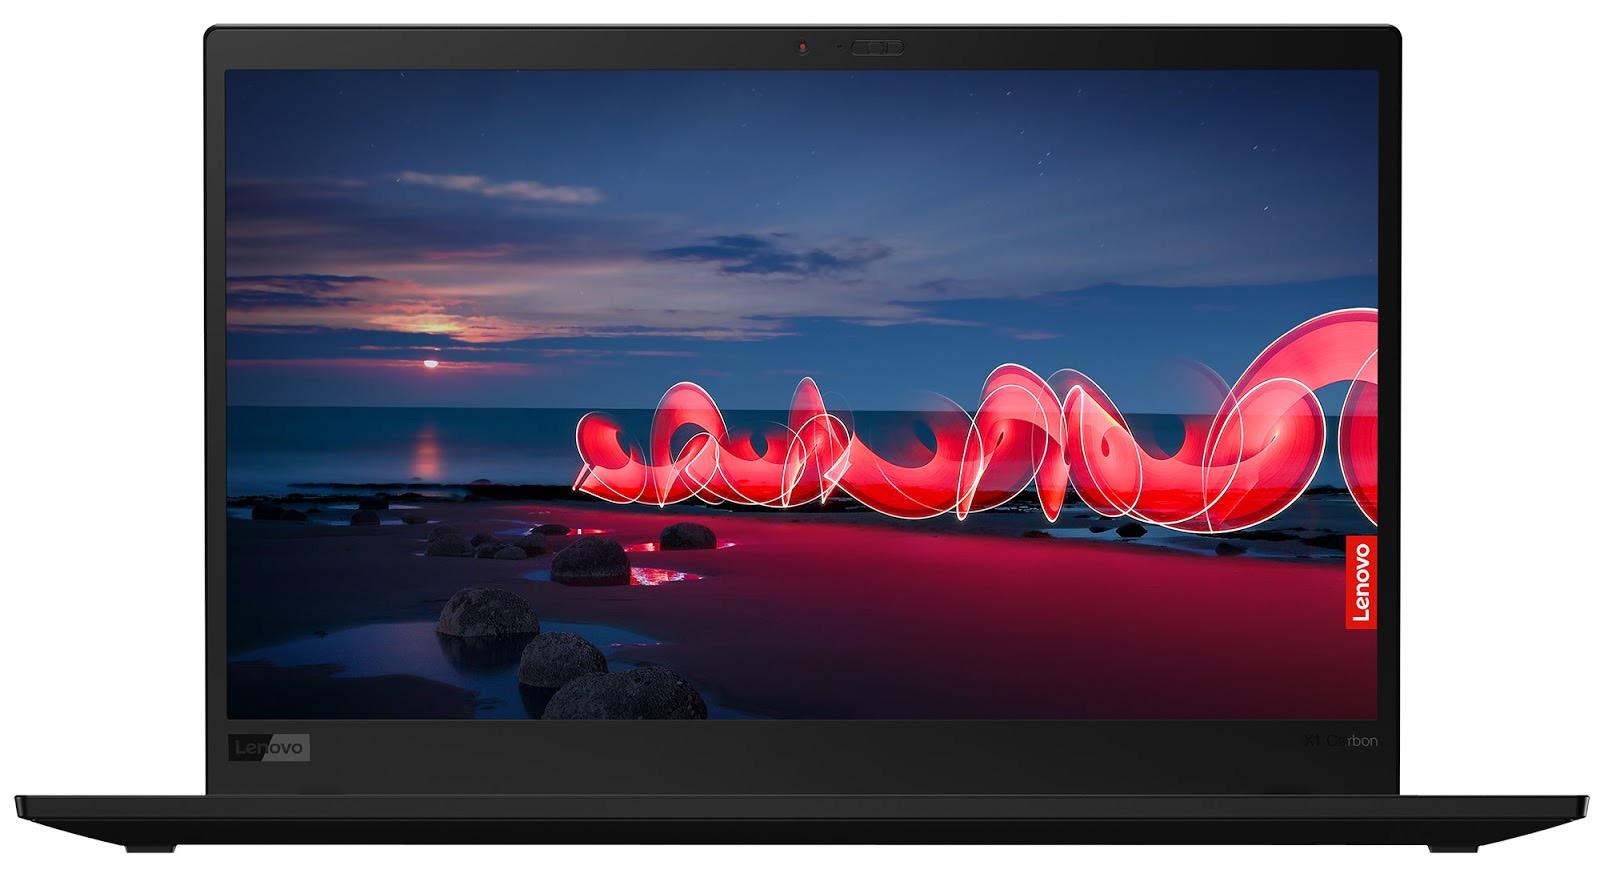 Фото 4. Ноутбук Lenovo ThinkPad X1 Carbon Gen 8 Black (20U90003RT)